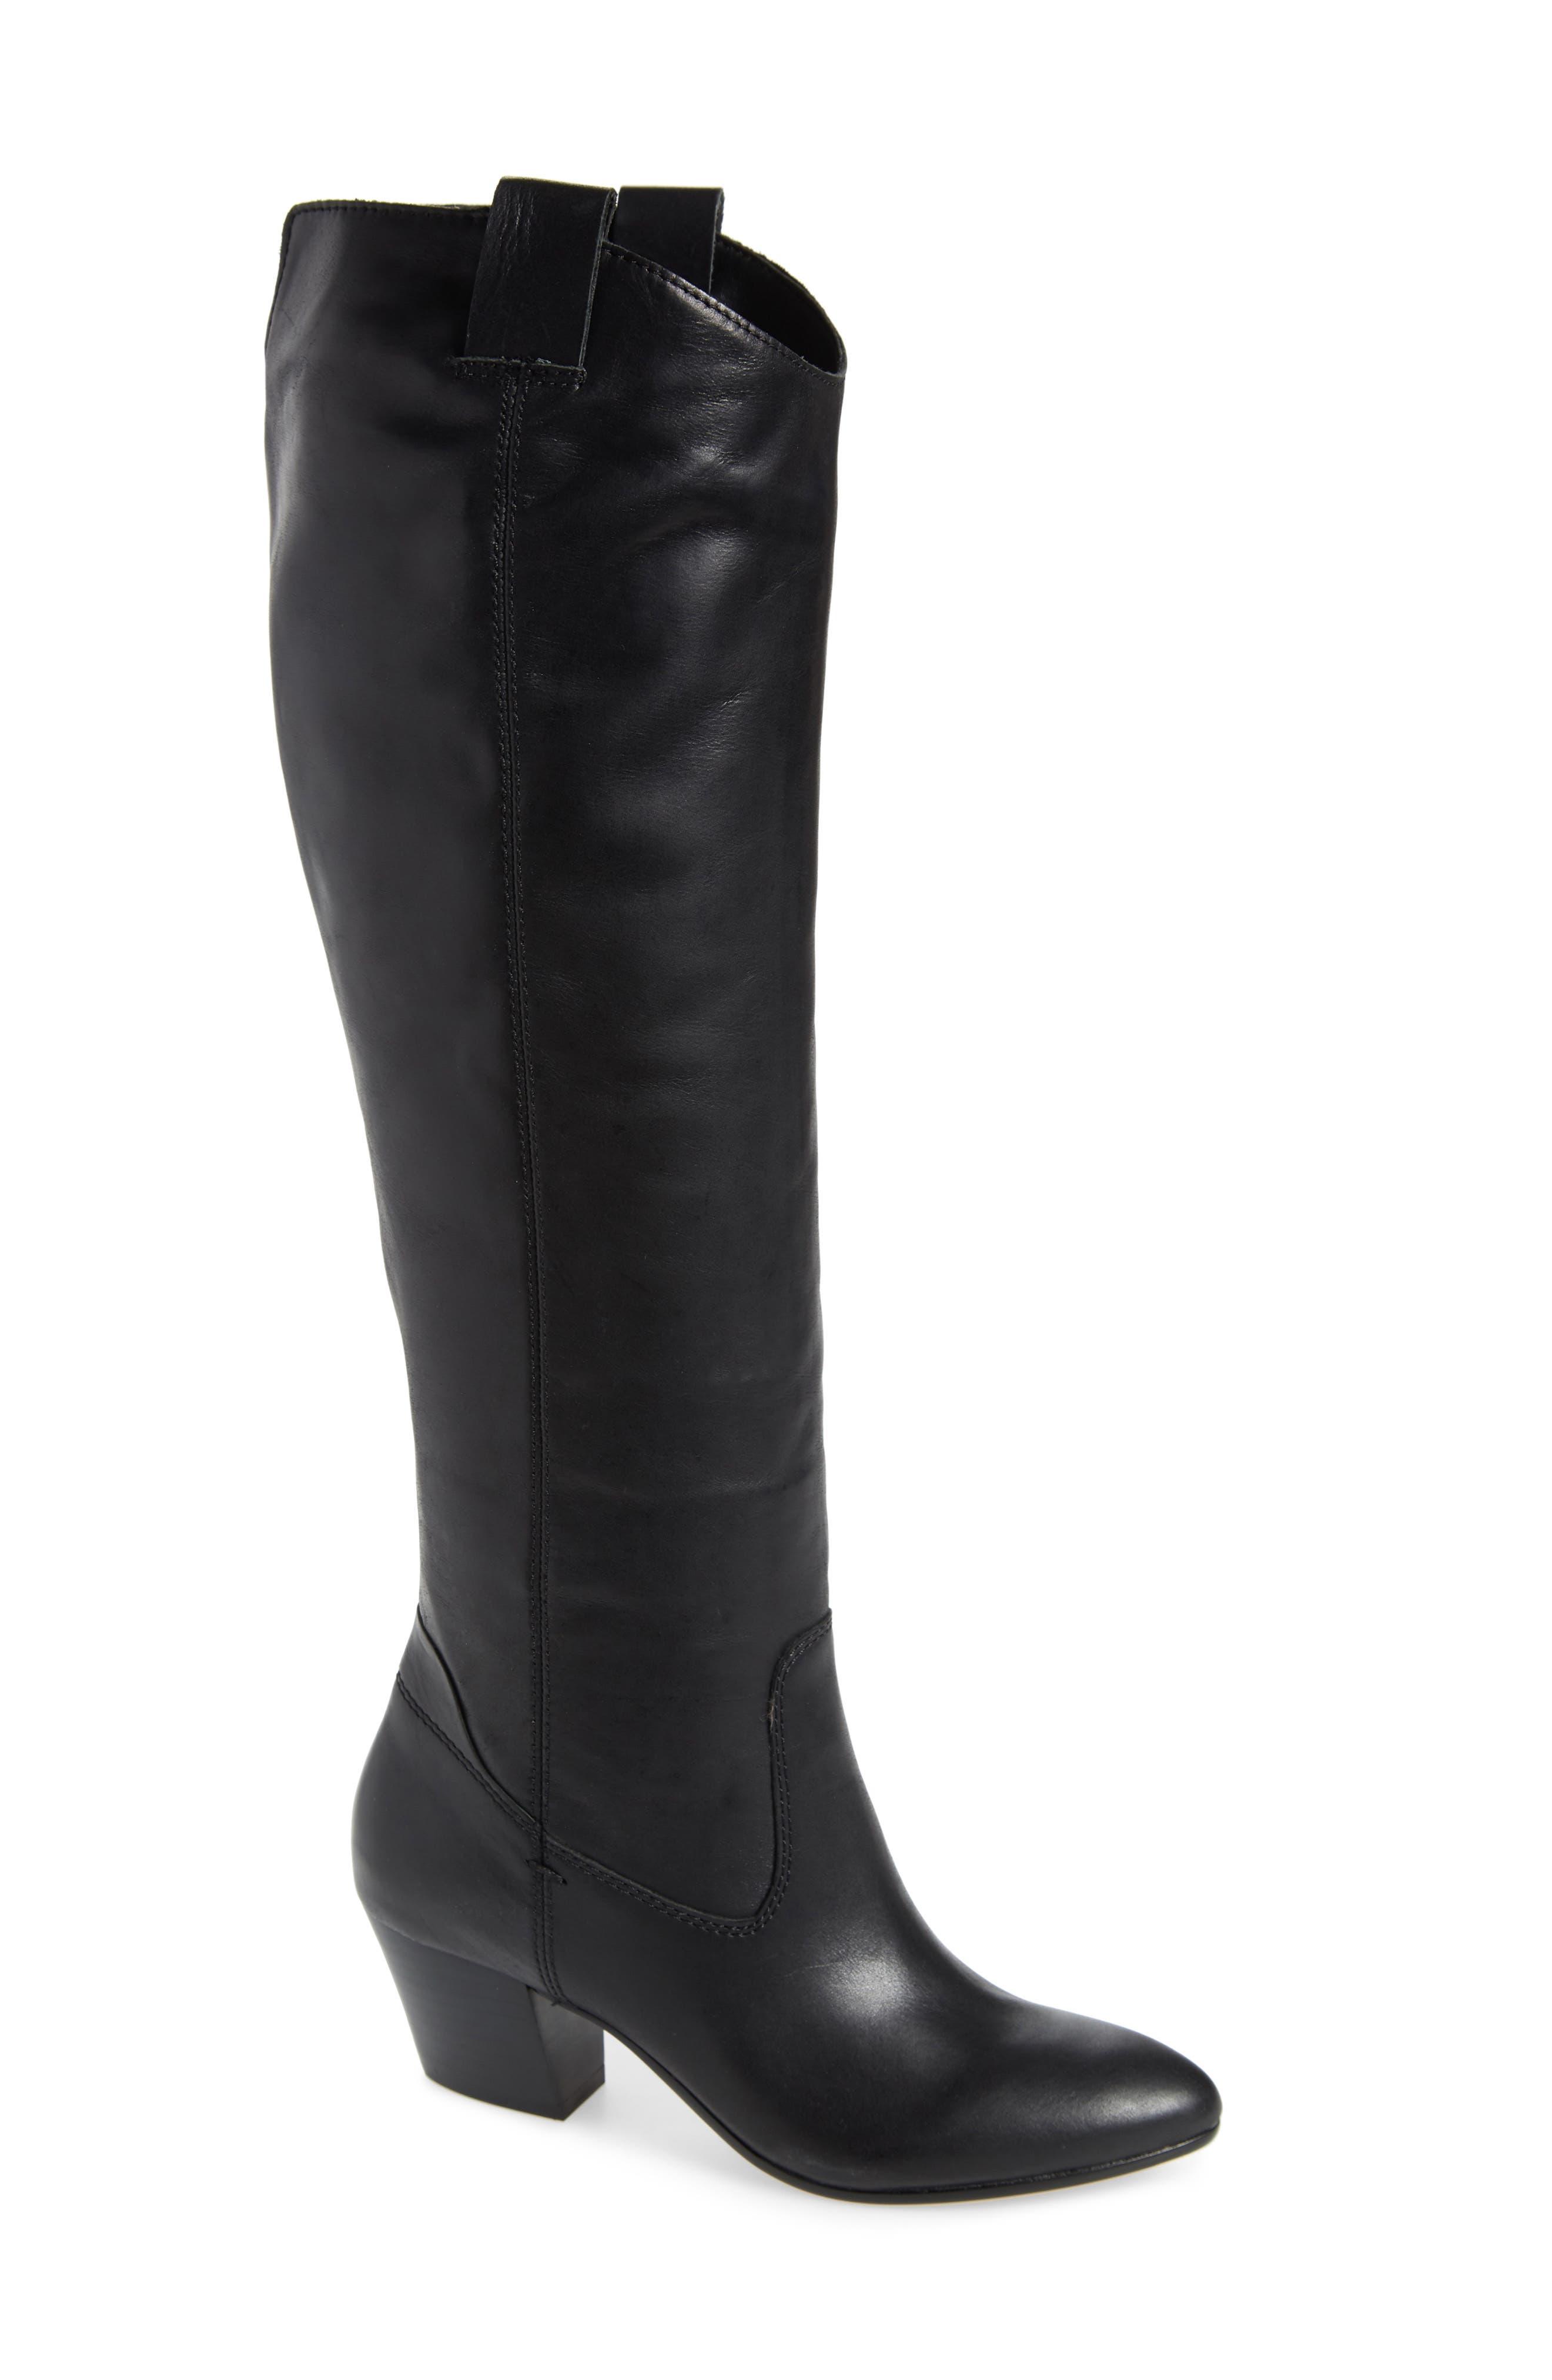 Dolce Vita Hinley Knee High Boot, Black